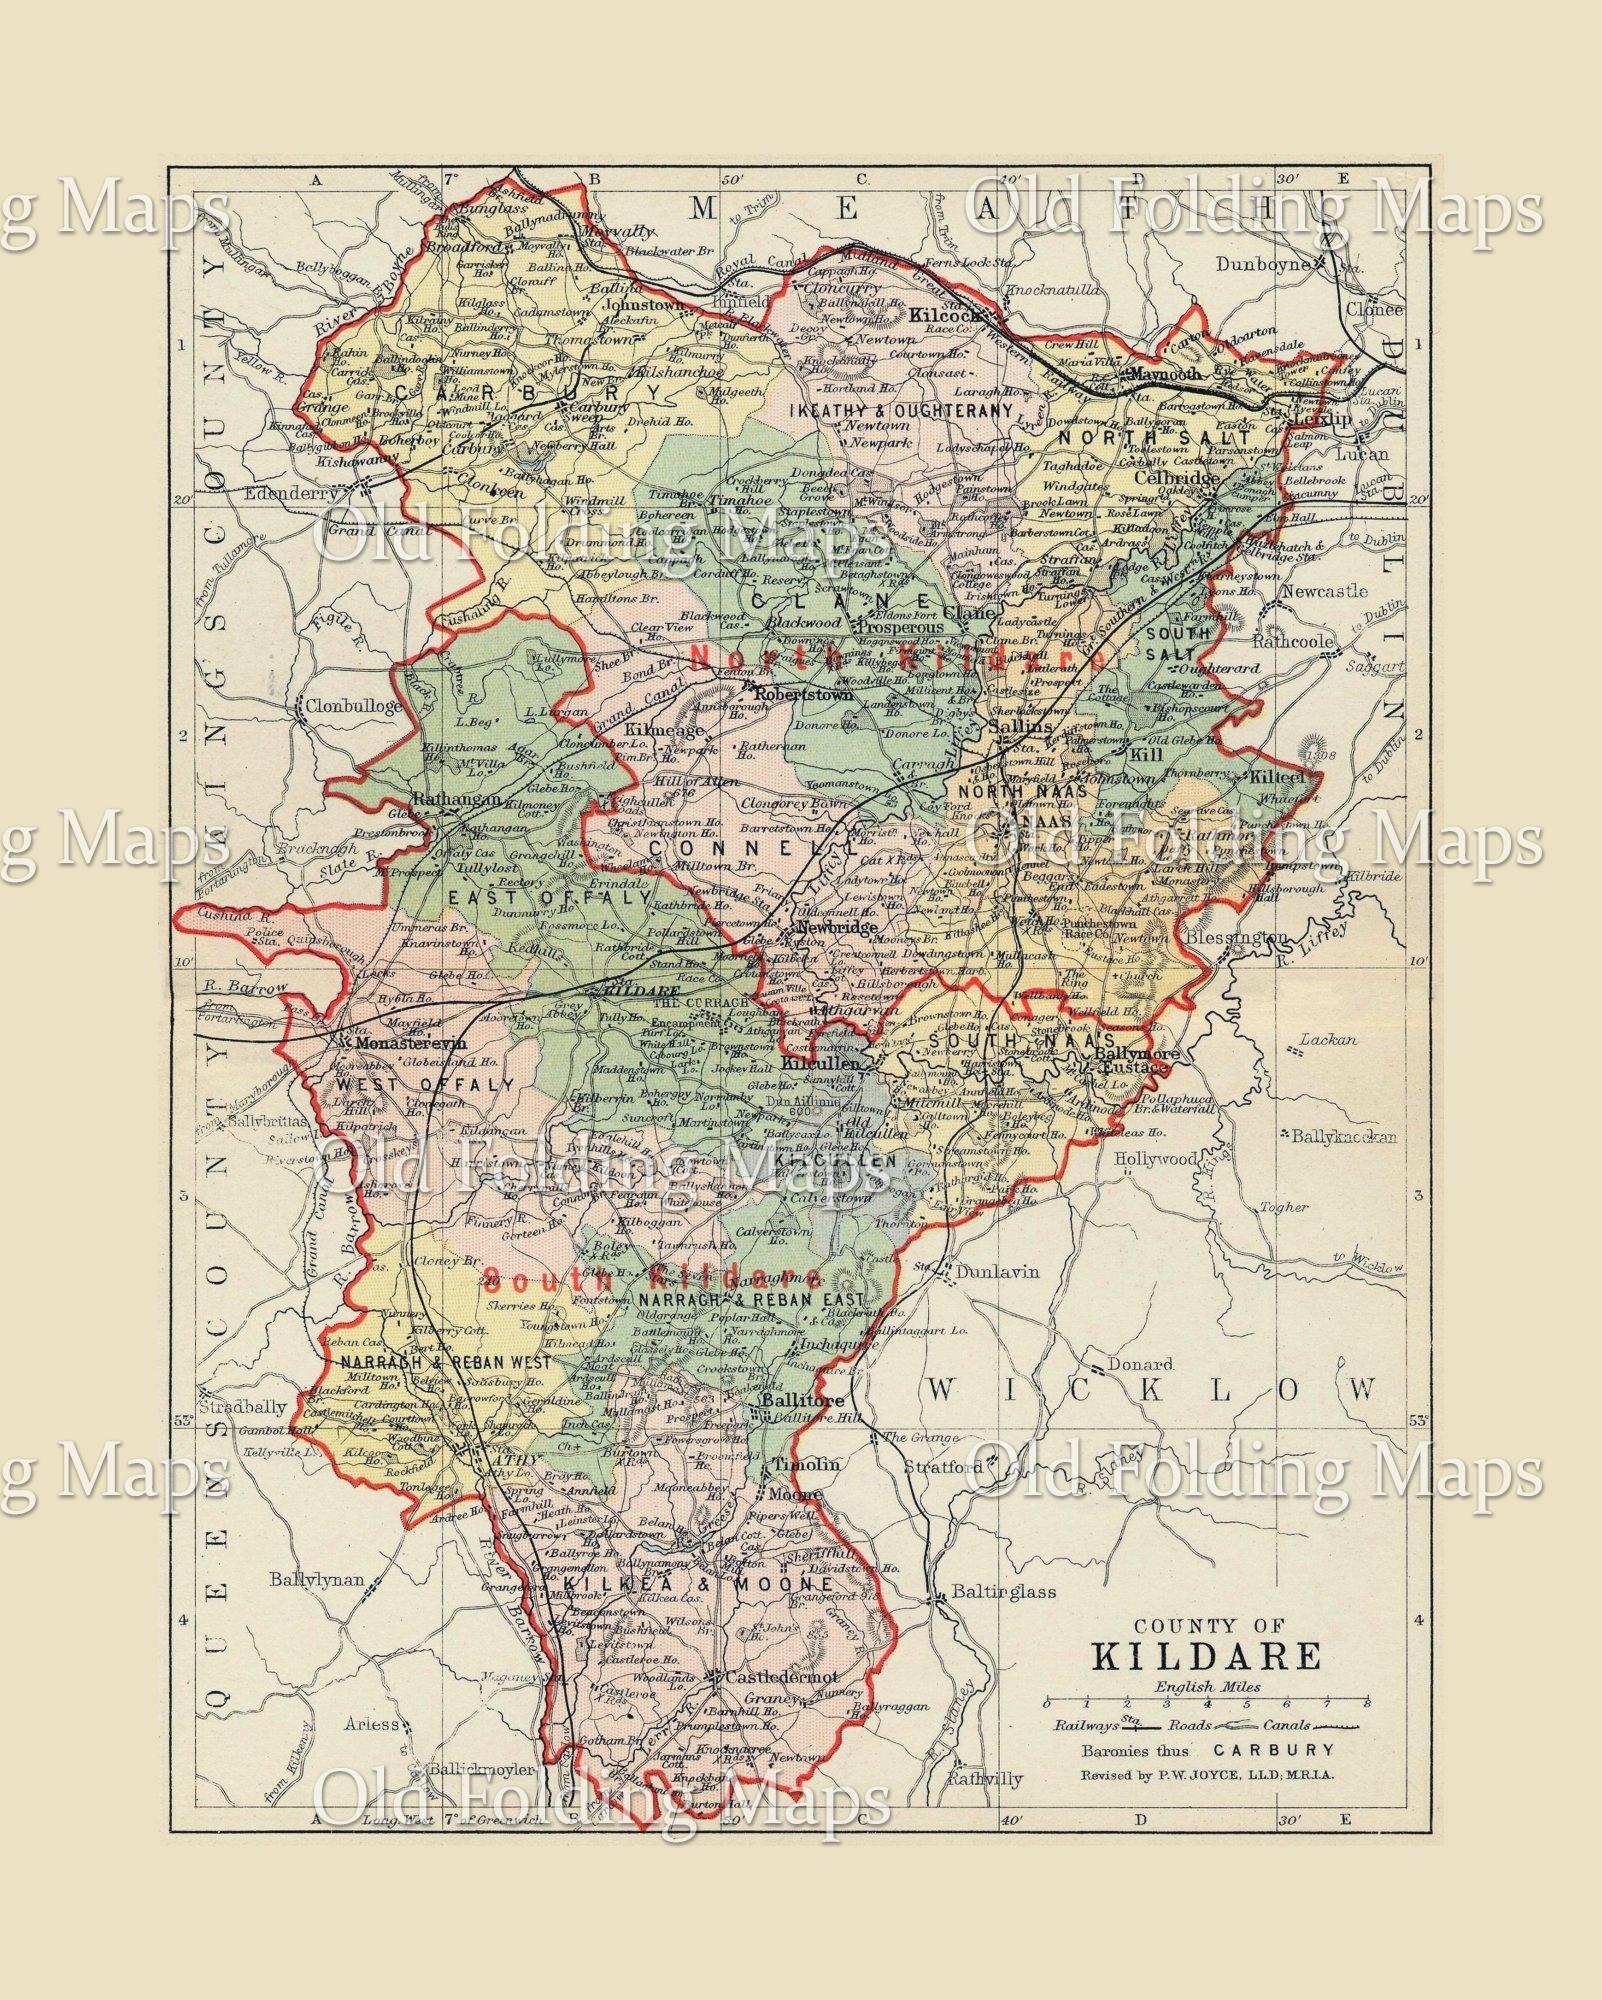 Antique County Map Of Kildare Ireland Circa 1884